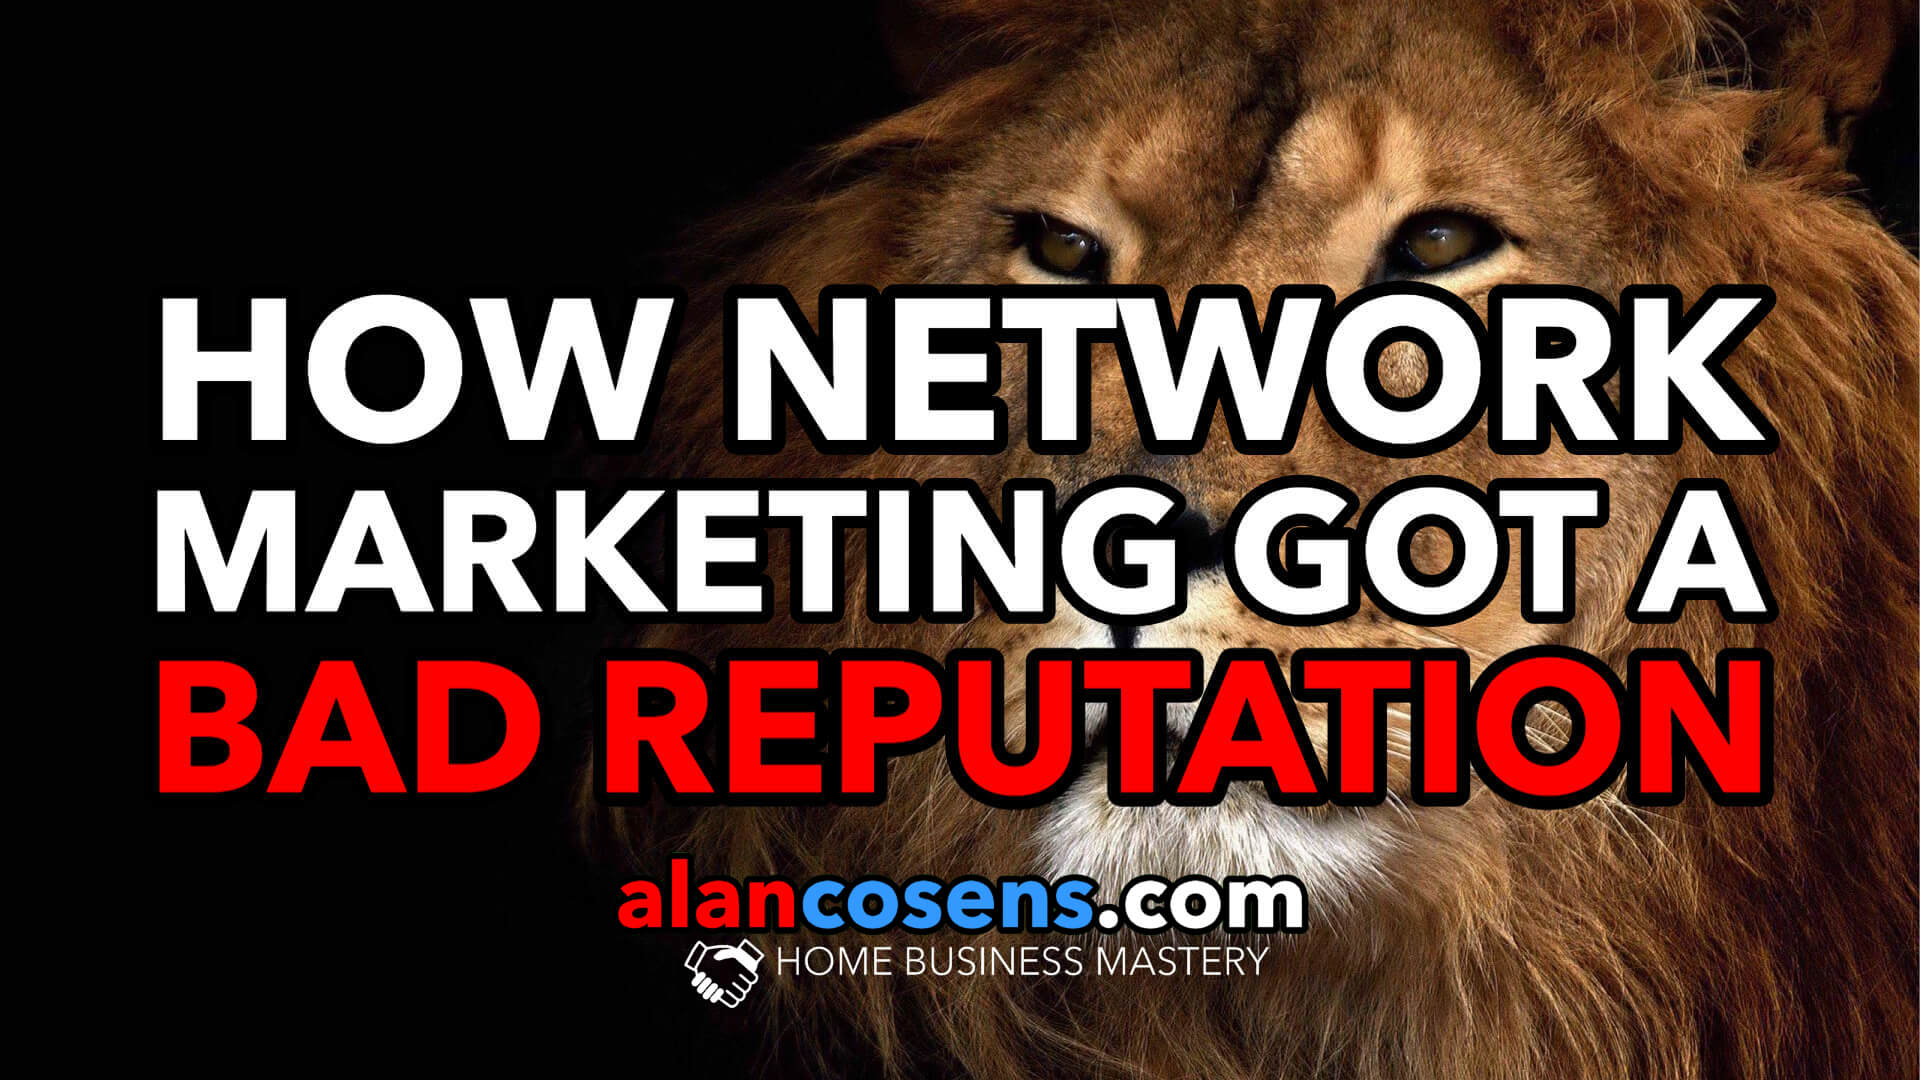 How Network Marketing Got A Bad Reputation